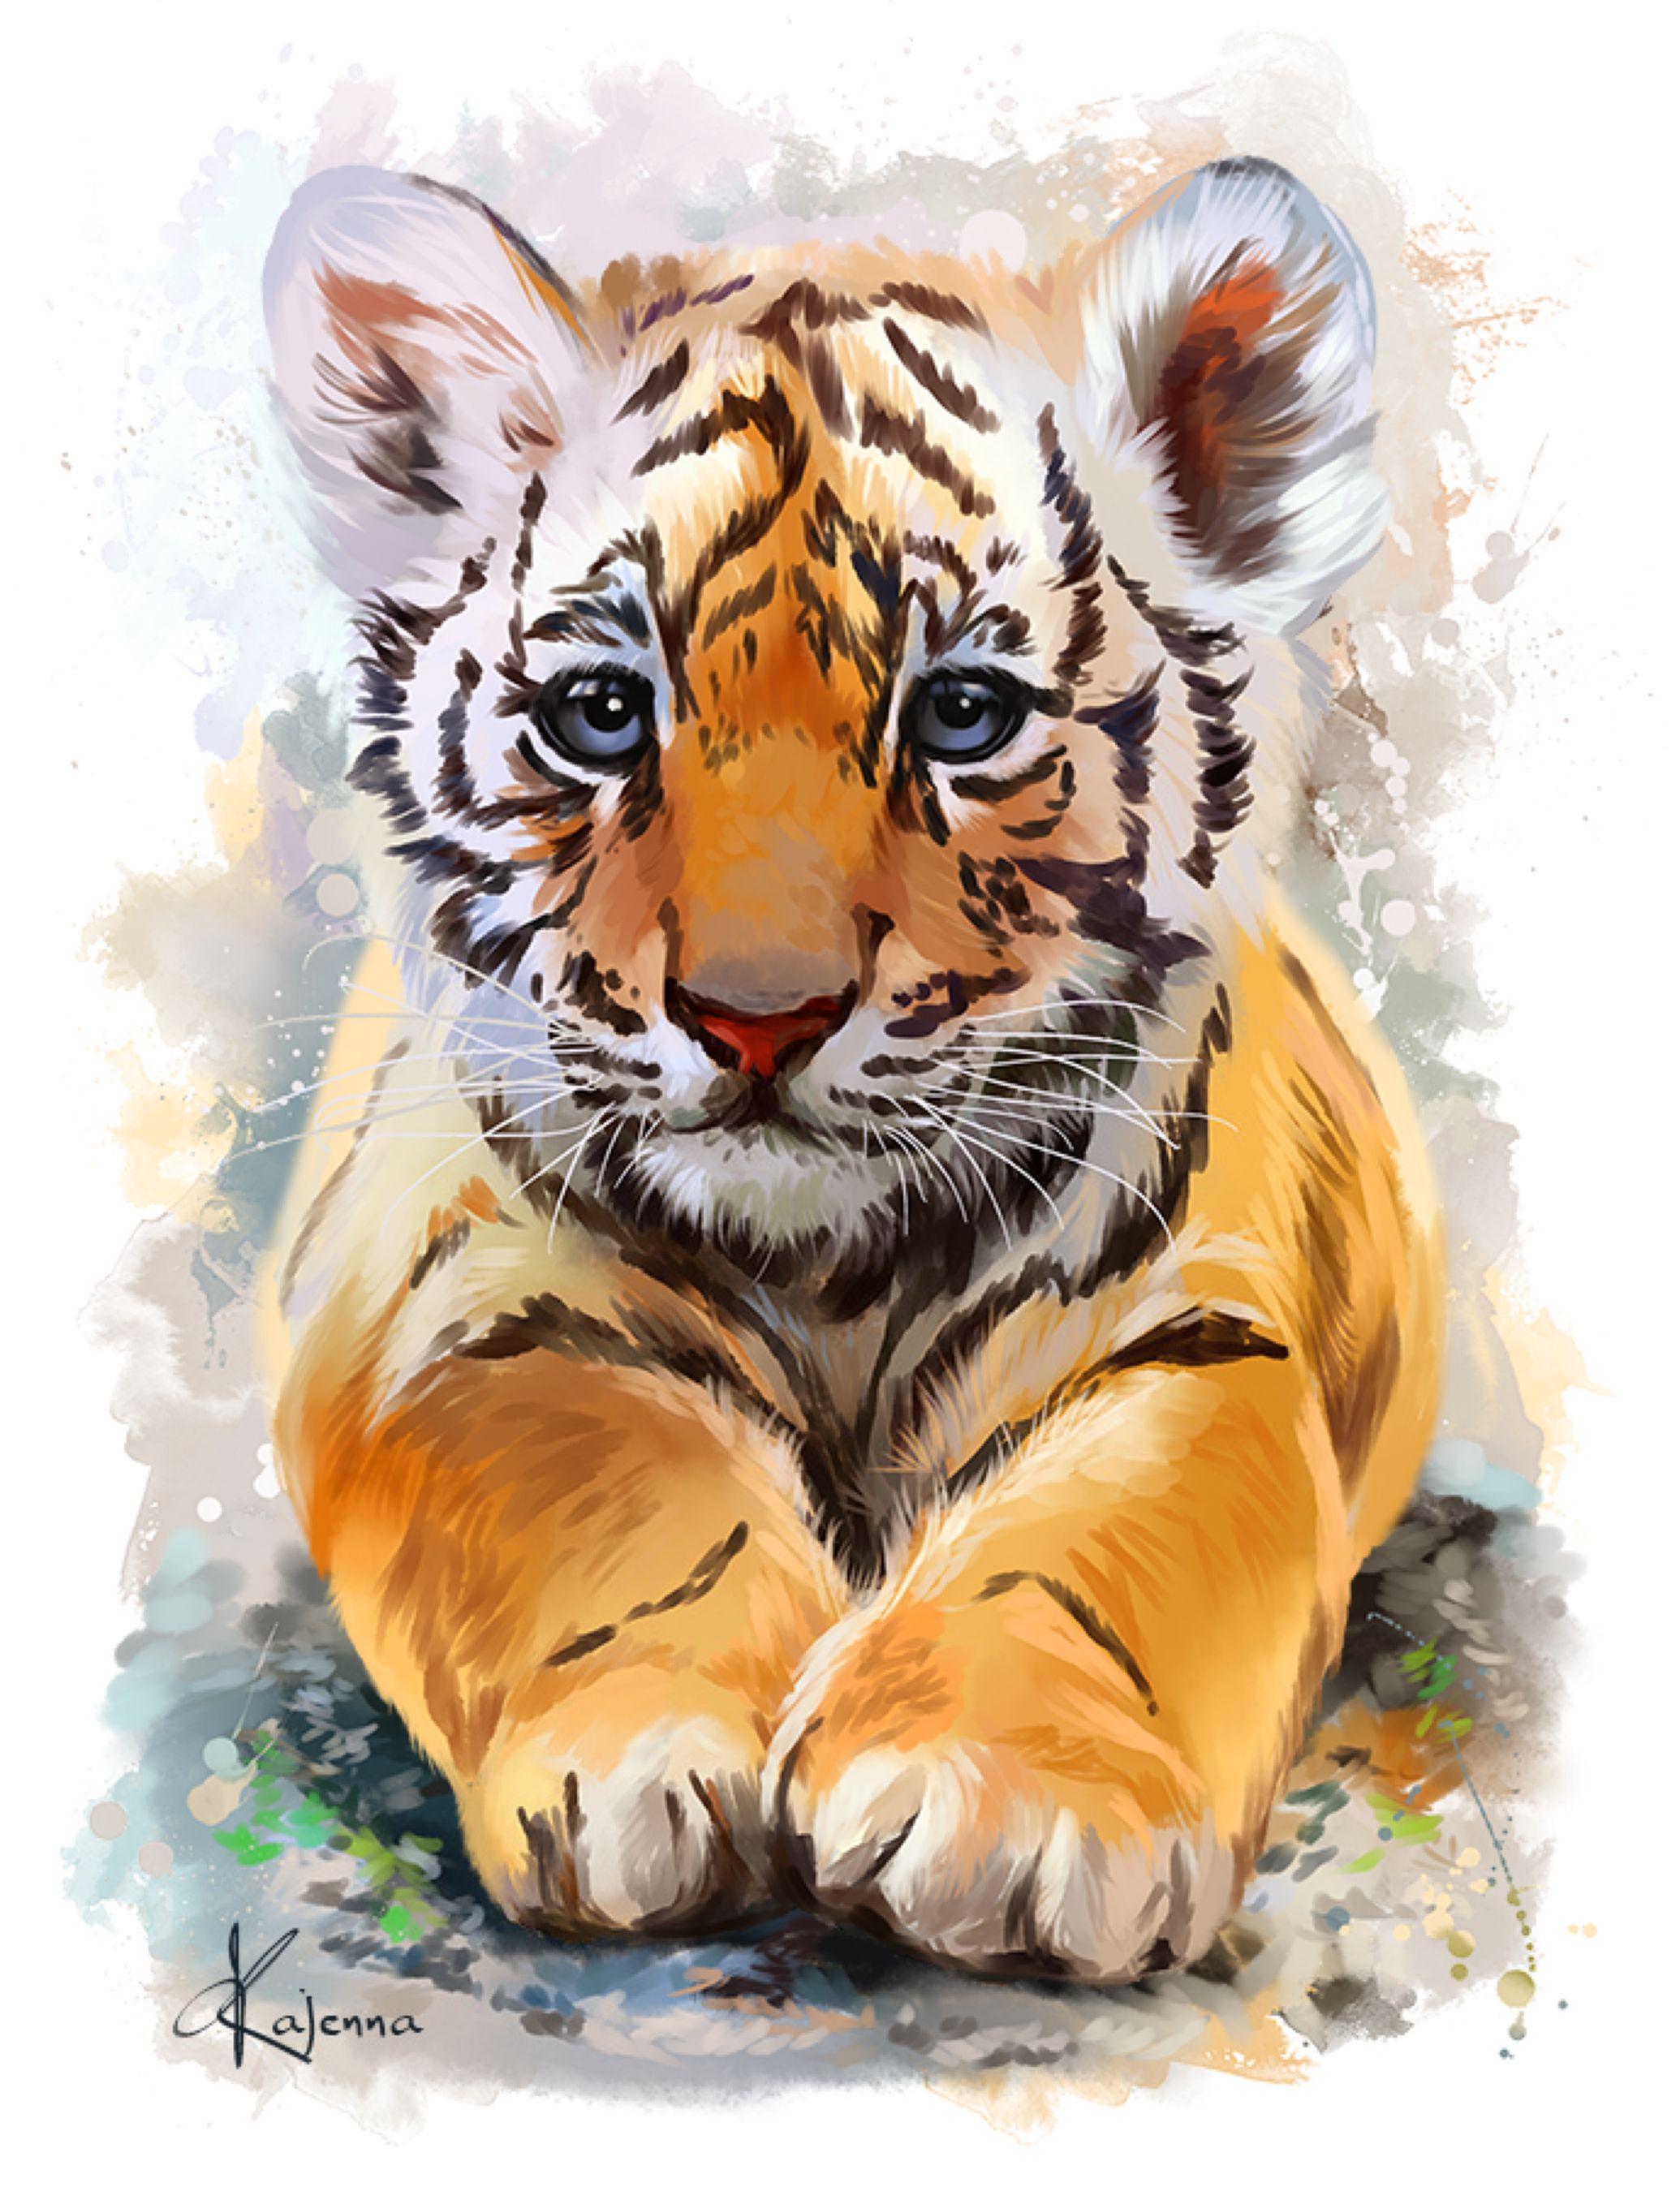 Little Tiger By Kajenna On Deviantart Watercolor Tiger Animal